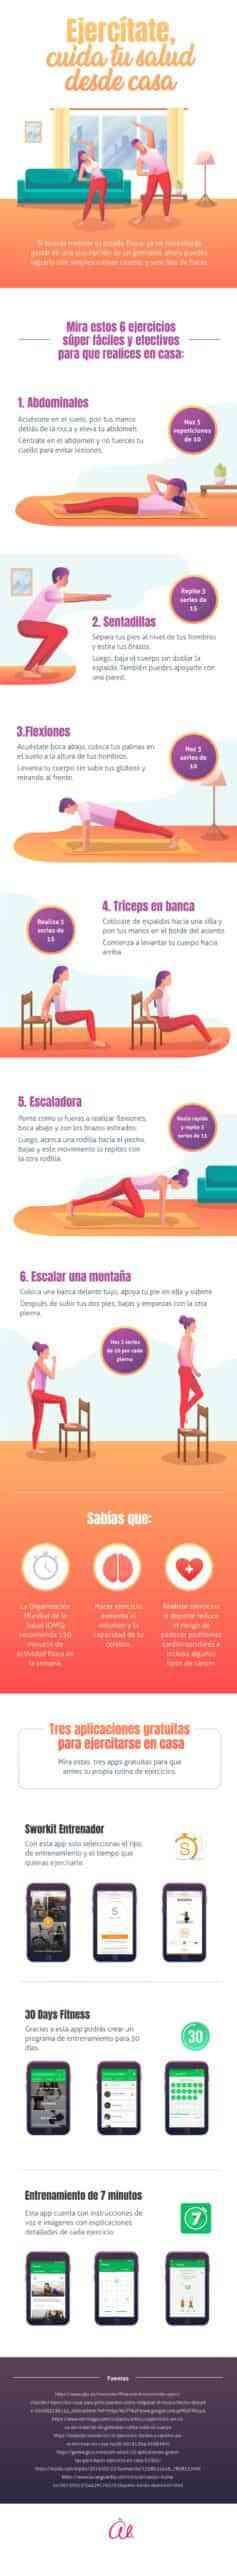 ejercicios para hacer en casa infografia scaled